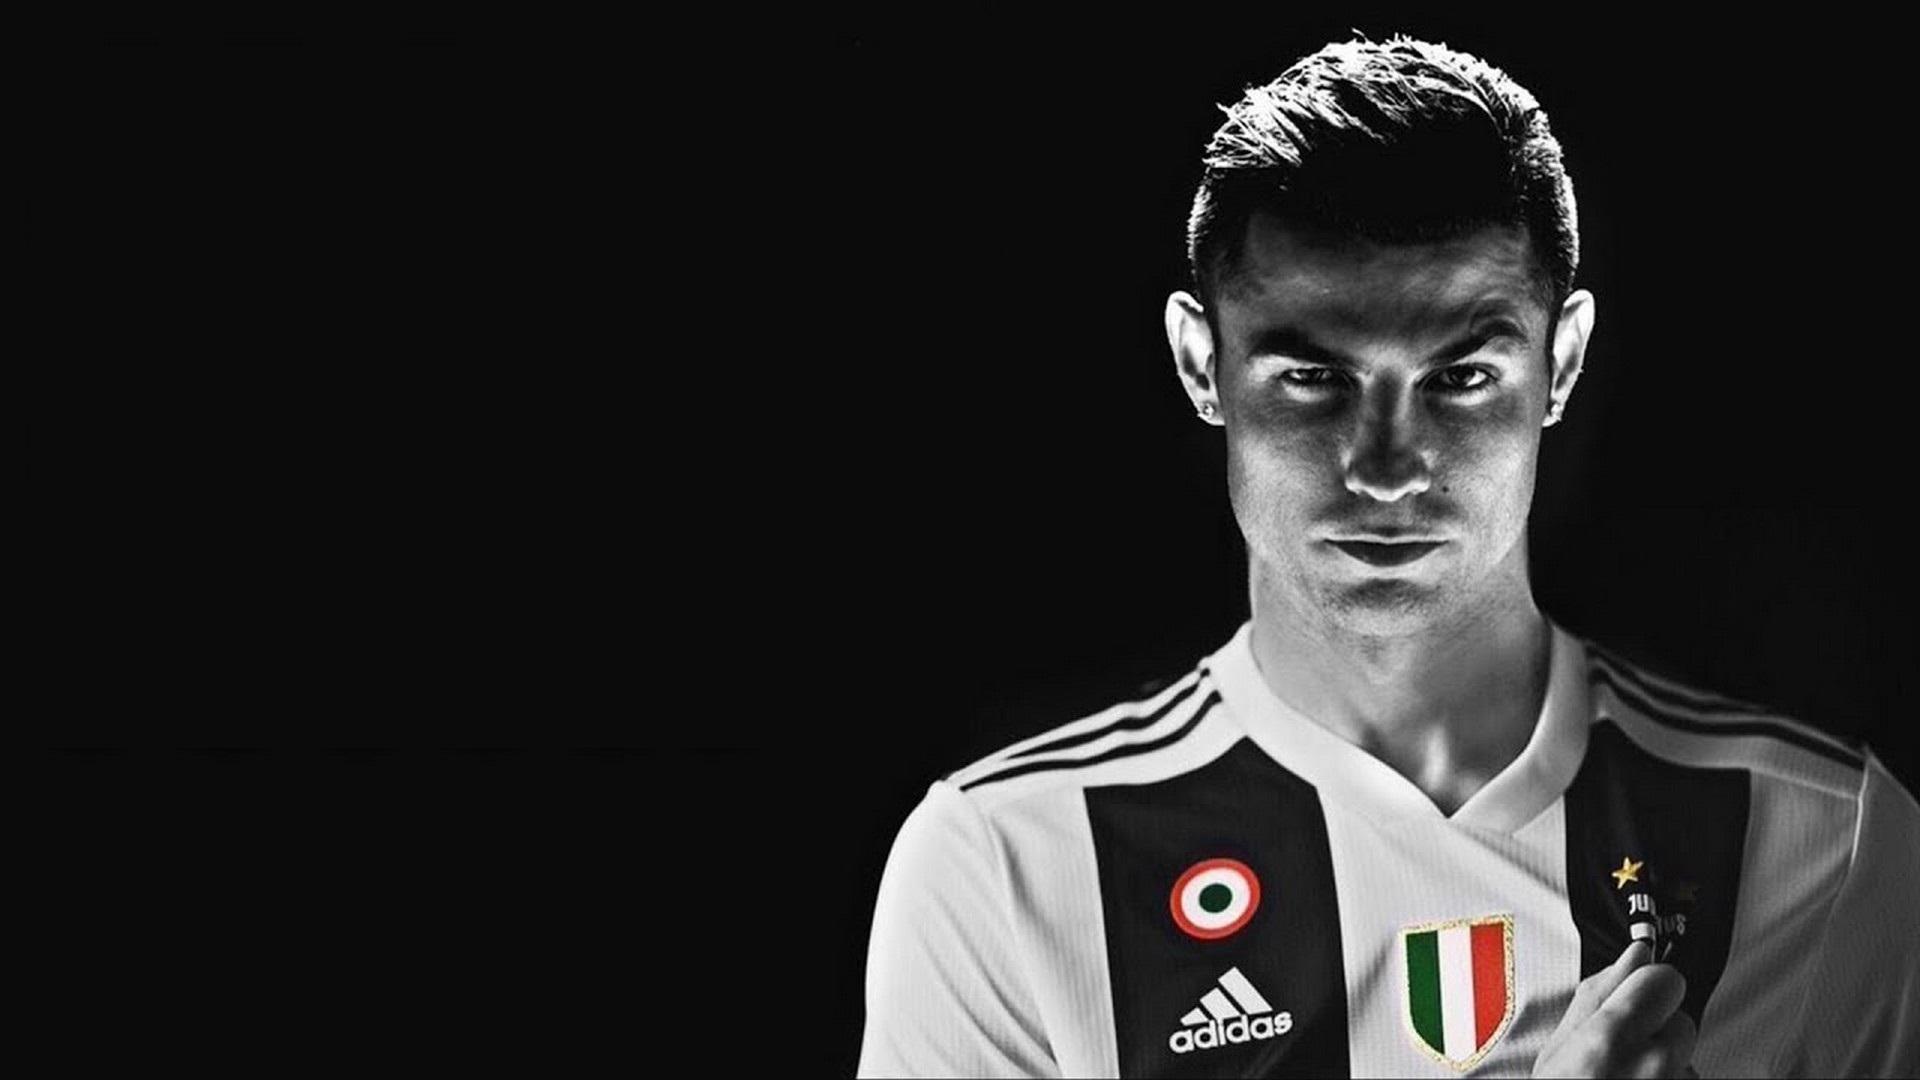 Desktop Wallpaper Cristiano Ronaldo Juventus 2020 Cute Wallpapers 1920x1080